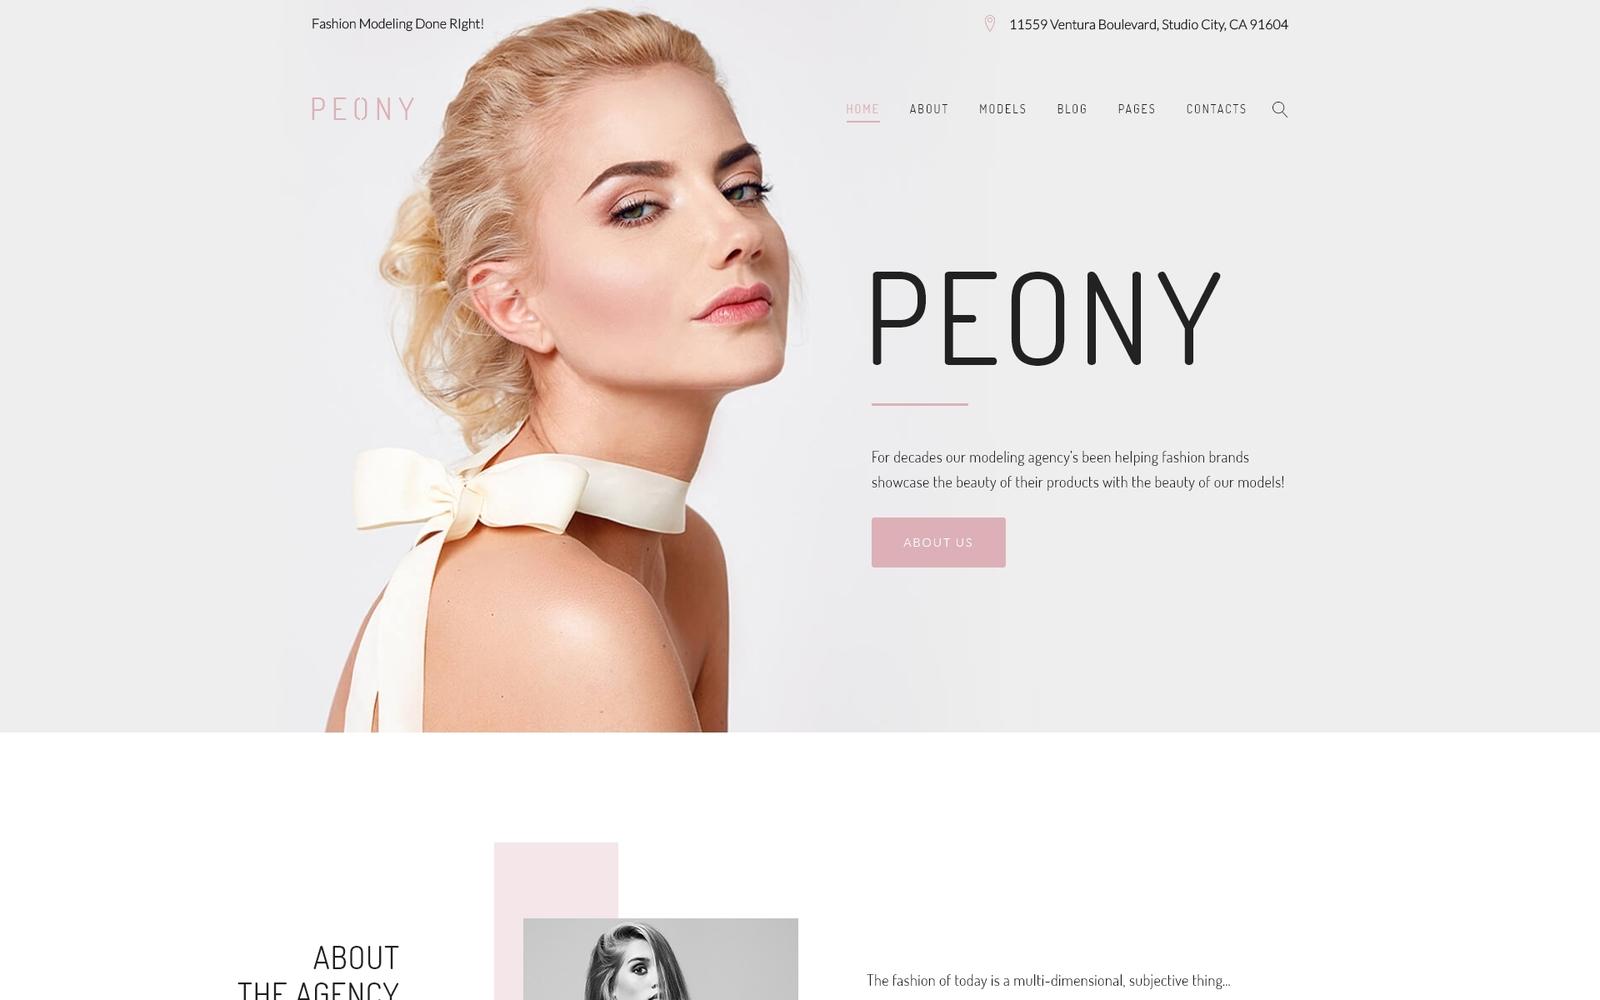 Peony - Fashion Modelling Agency WordPress Theme - screenshot